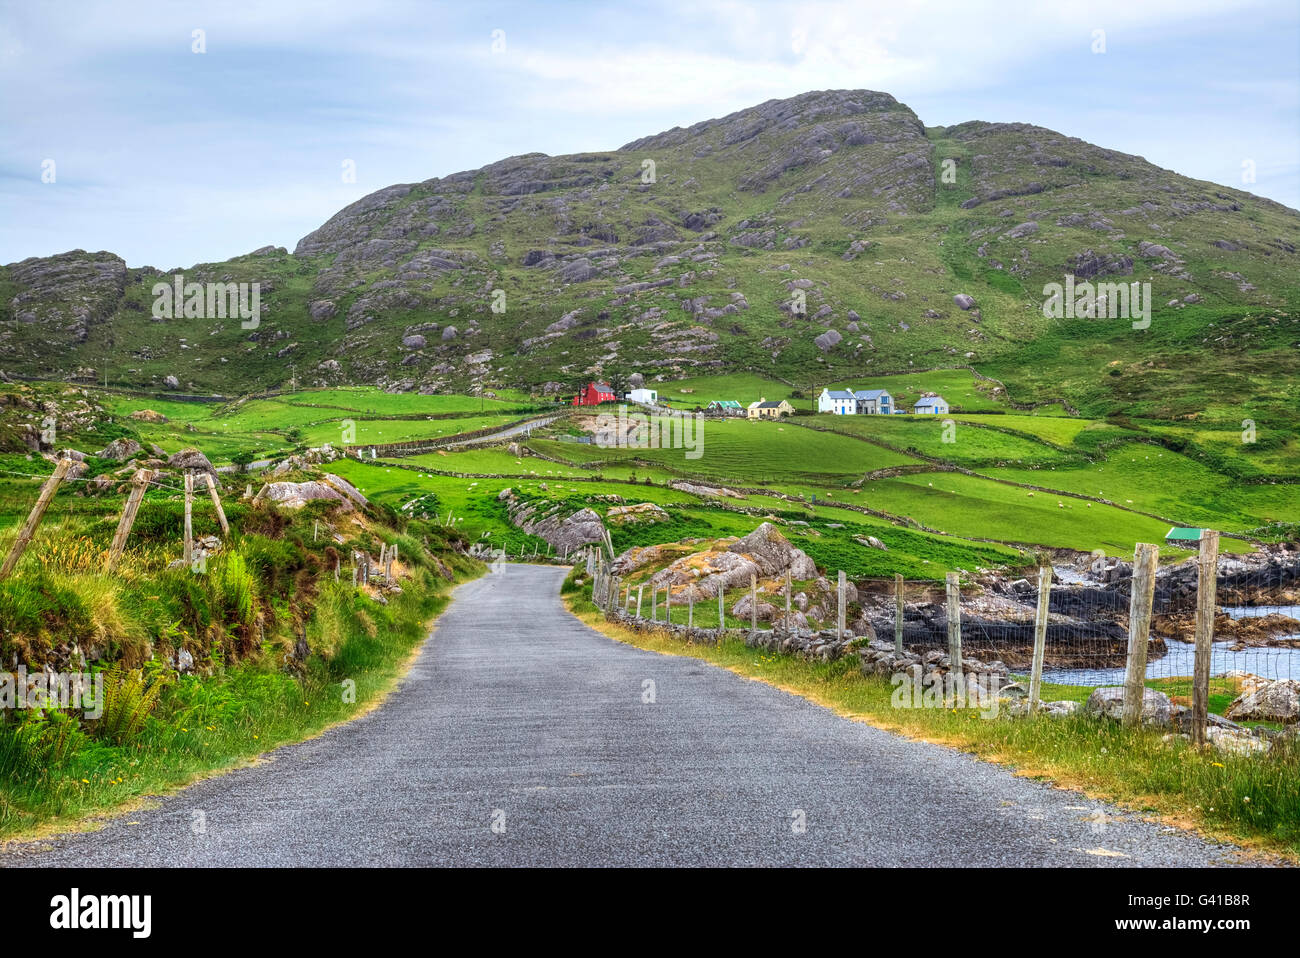 Cleanderry, Beara Peninsula, County Cork, Ireland - Stock Image